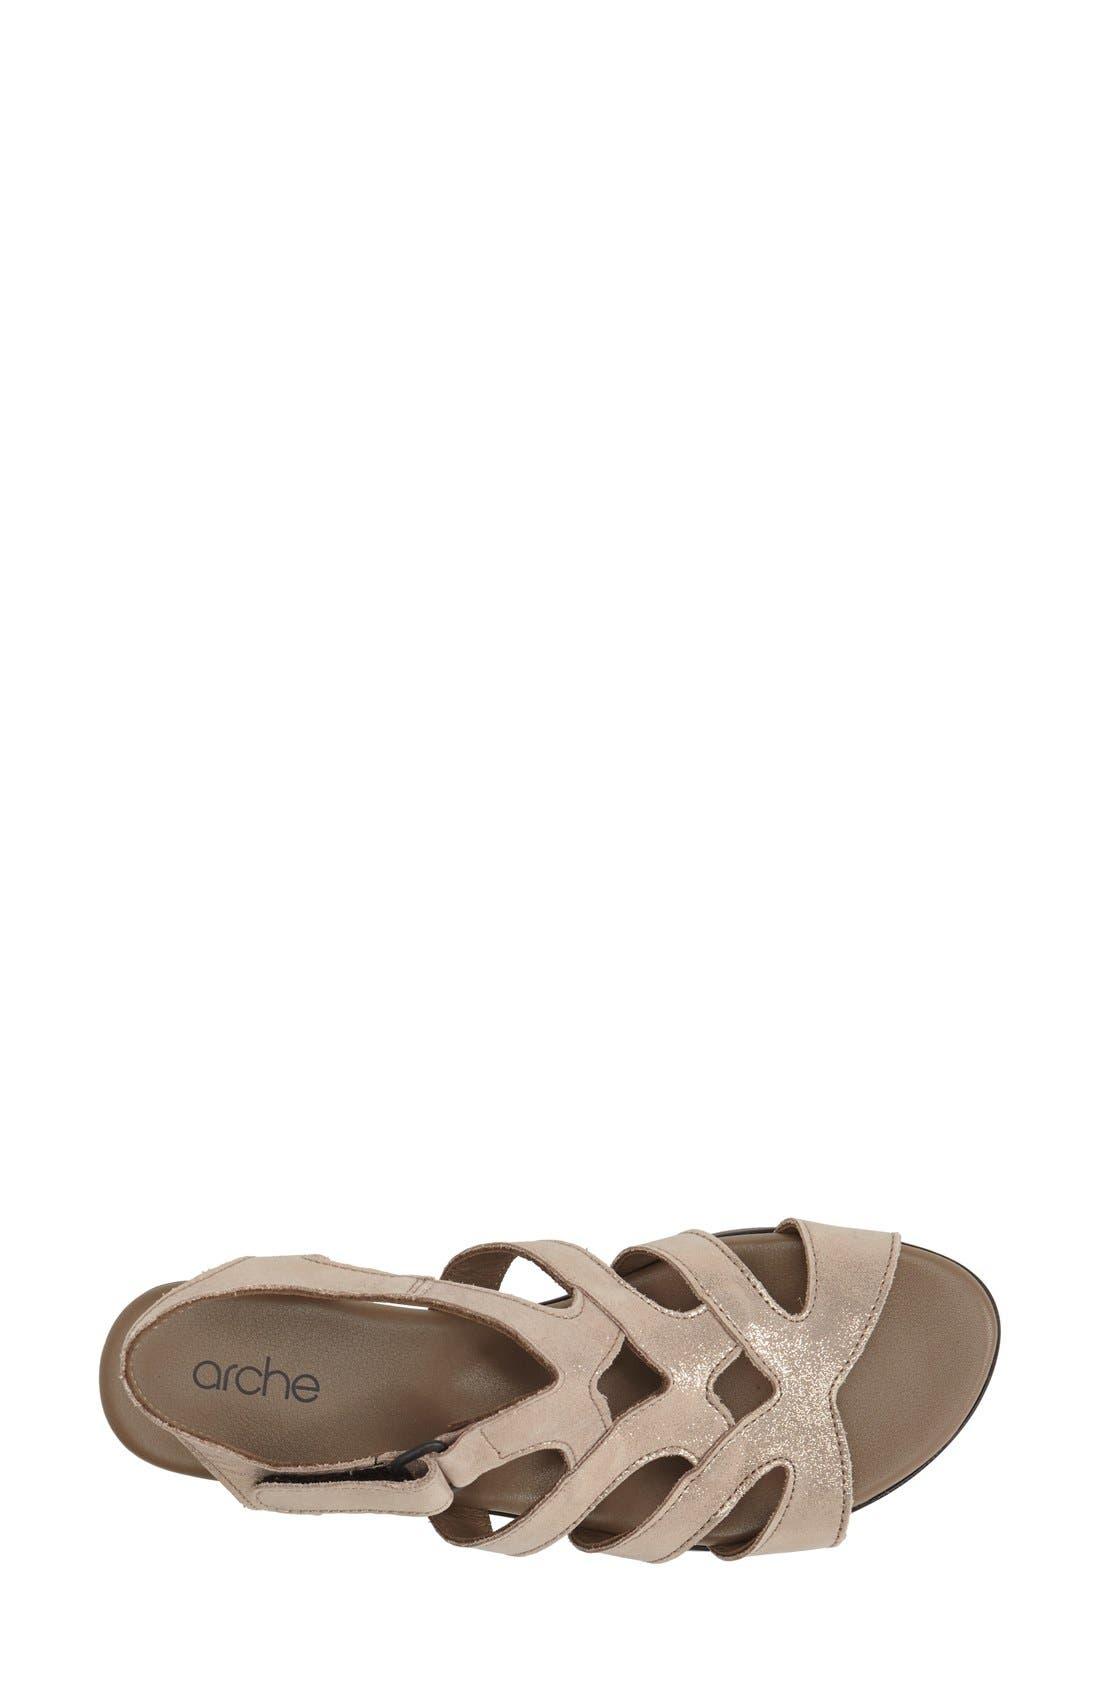 'Obela' Water Resistant Leather Sandal,                             Alternate thumbnail 15, color,